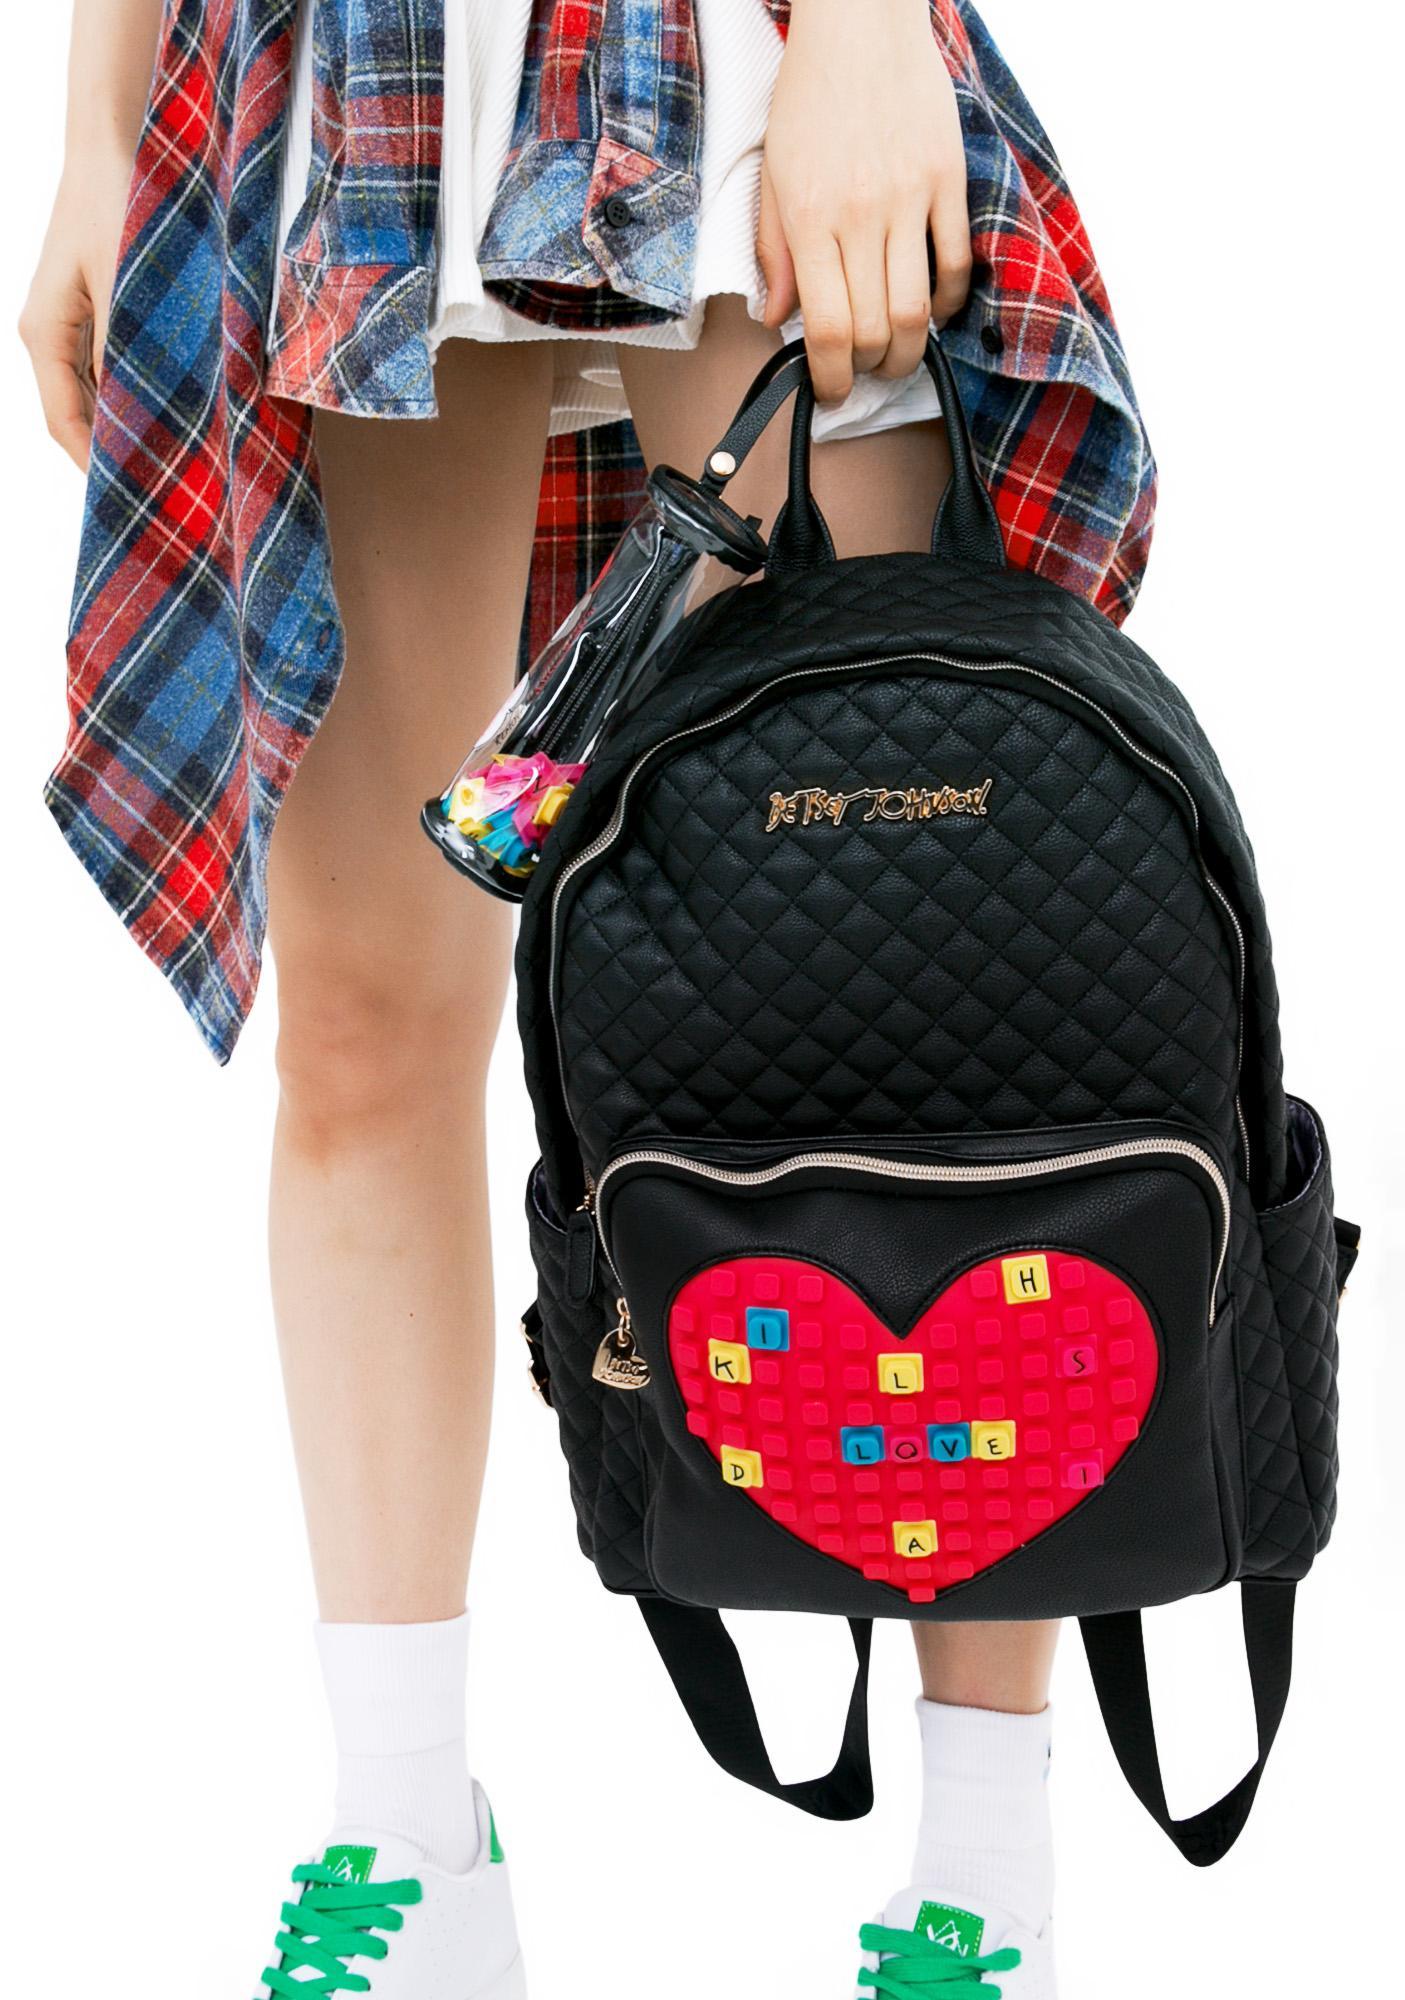 Pink brand backpack ebay fenix toulouse handball jpg 1405x2000 Ebay nike  latest bags 0fd8138301f89